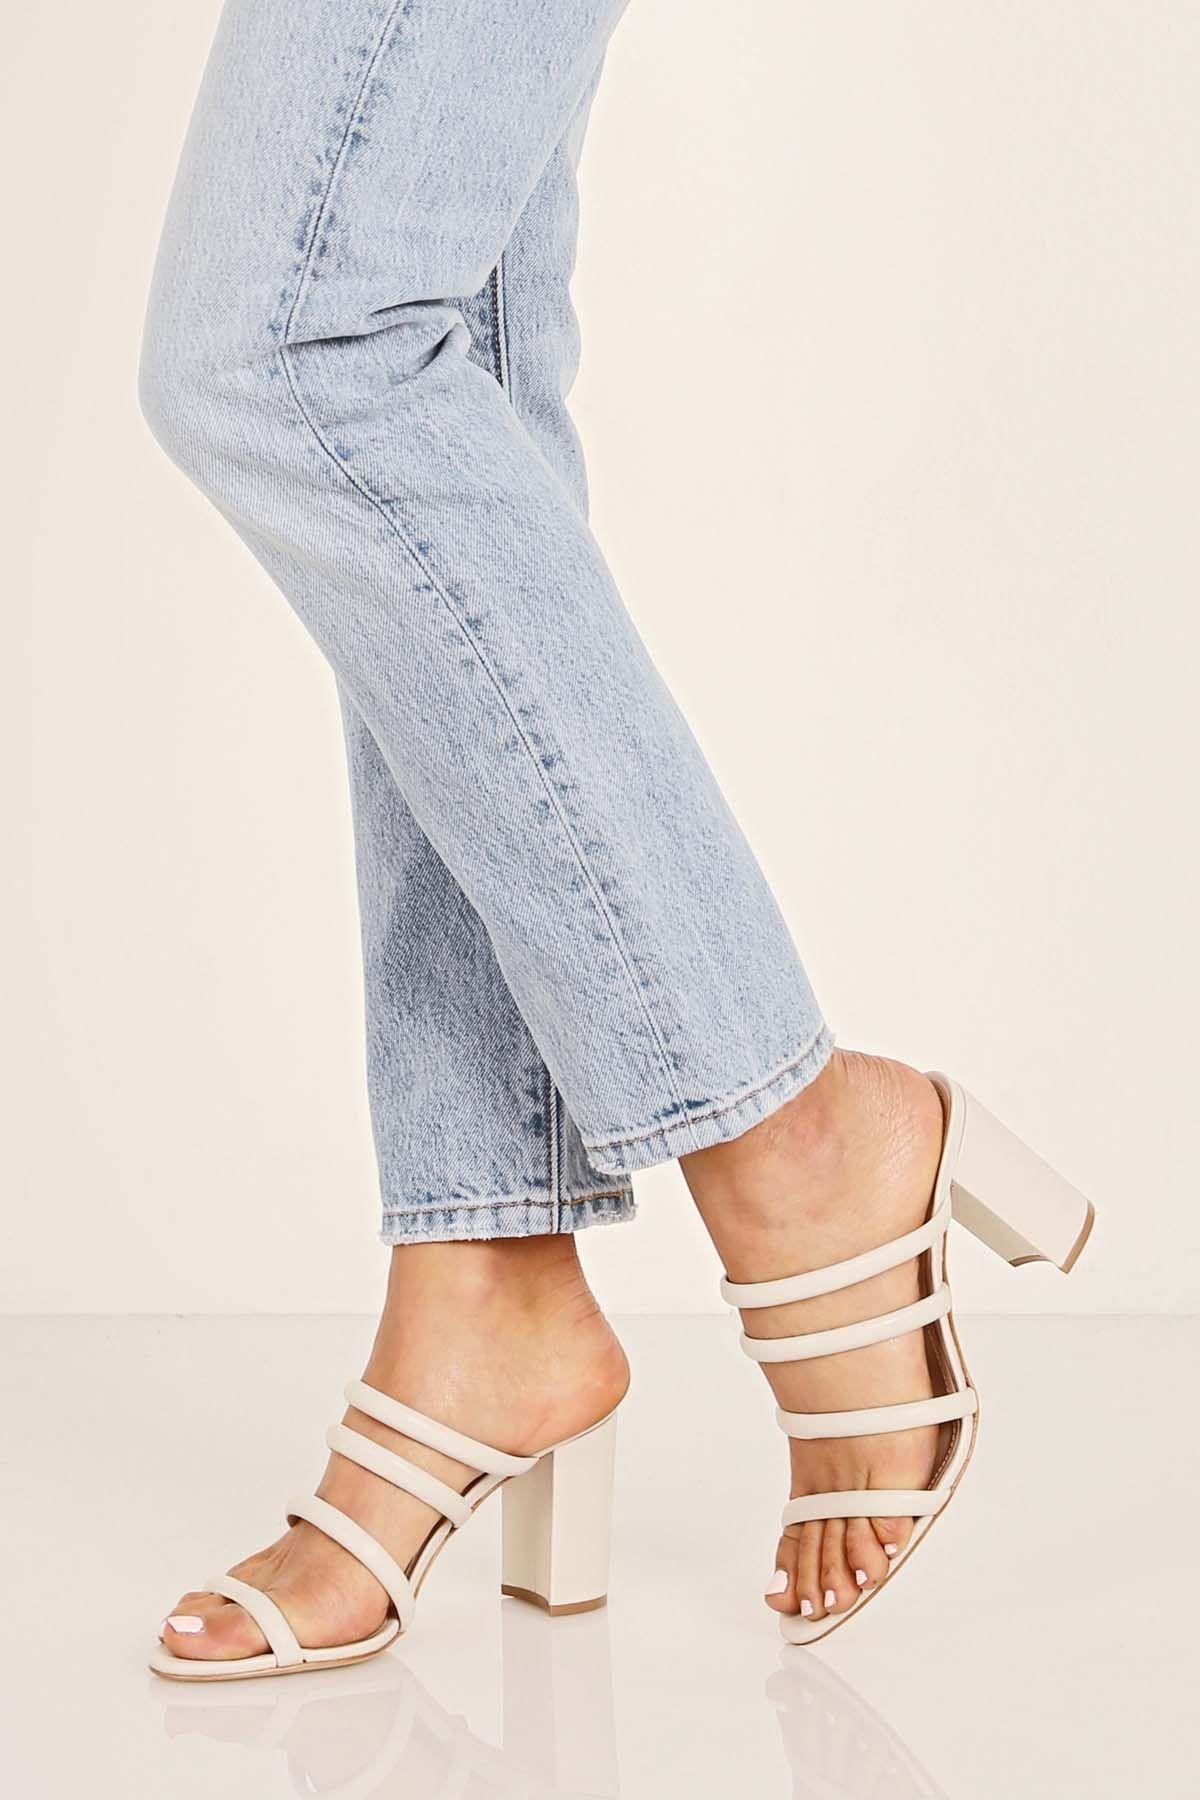 37bbdd93ba53 Shoes to dress us your denim  Schutz Shoes Felisa Heel. Off white strappy  slide with block heel